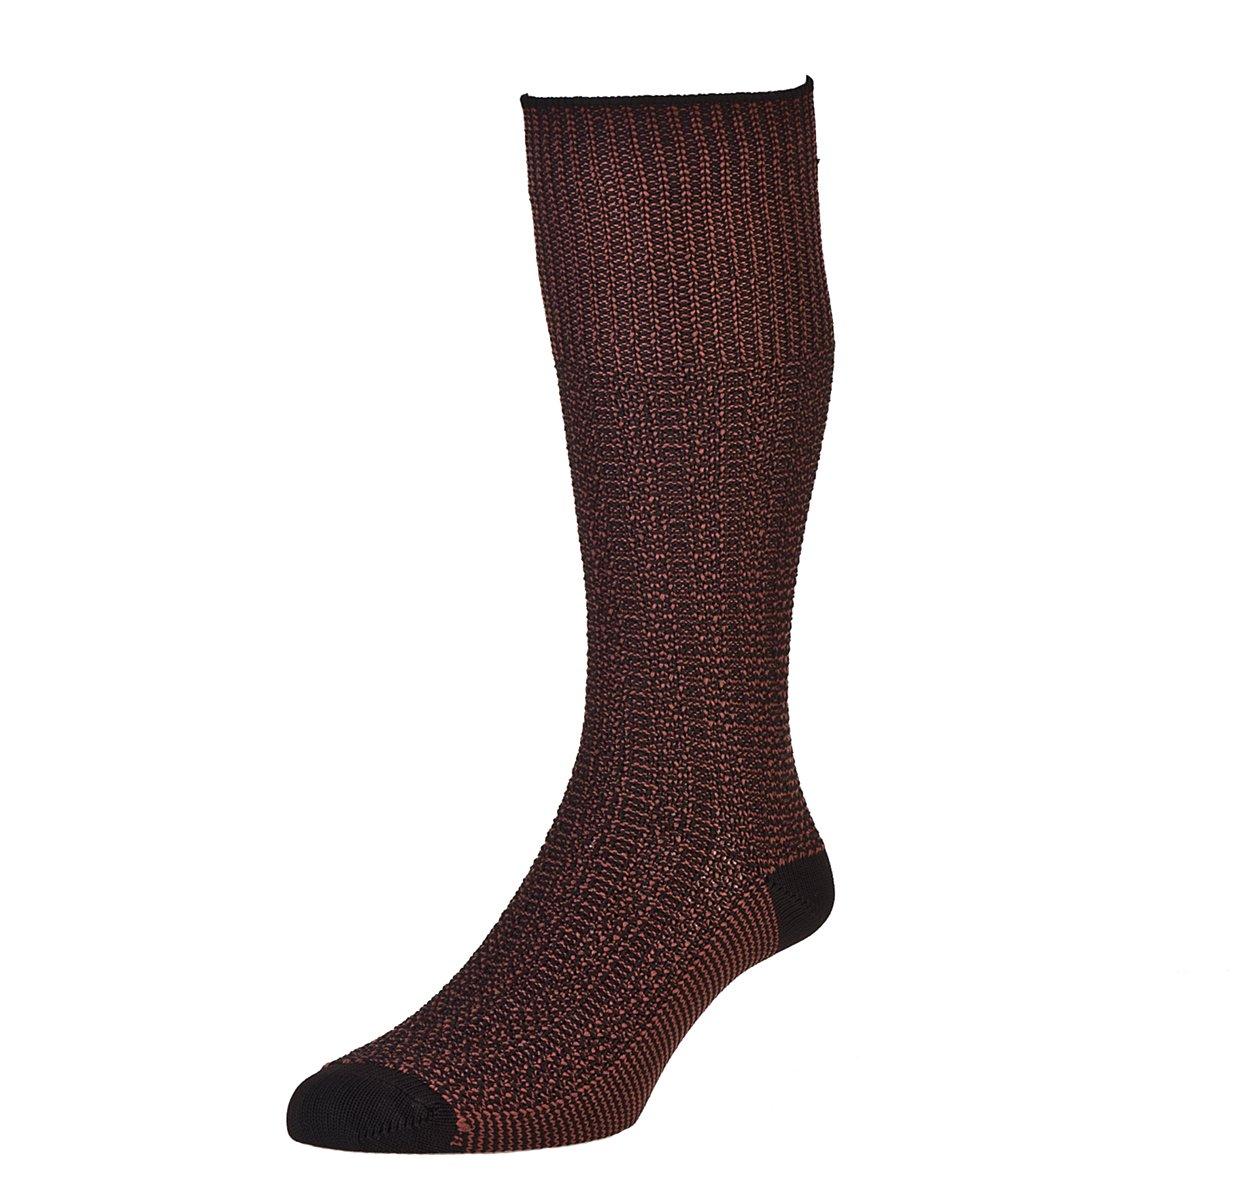 2 Pack Mens/Gentlemens HJ Hall Indestructible Marl Fancy Half Hose Socks ZZ-MSOXHJ4Long-2pk HJ4 Long